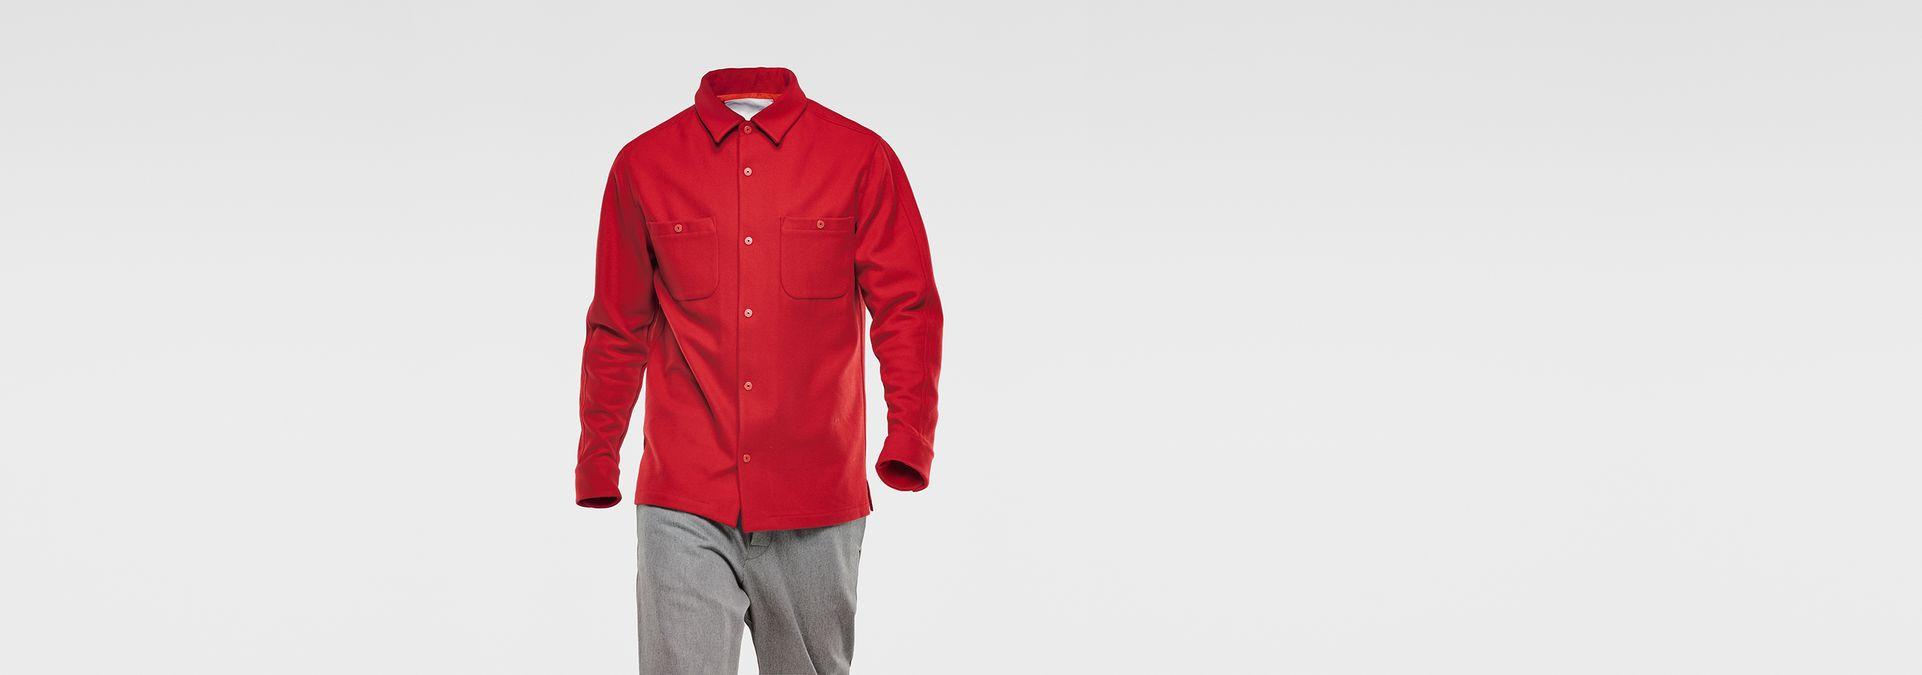 marc newson overshirt pompeian red men sale g star raw. Black Bedroom Furniture Sets. Home Design Ideas